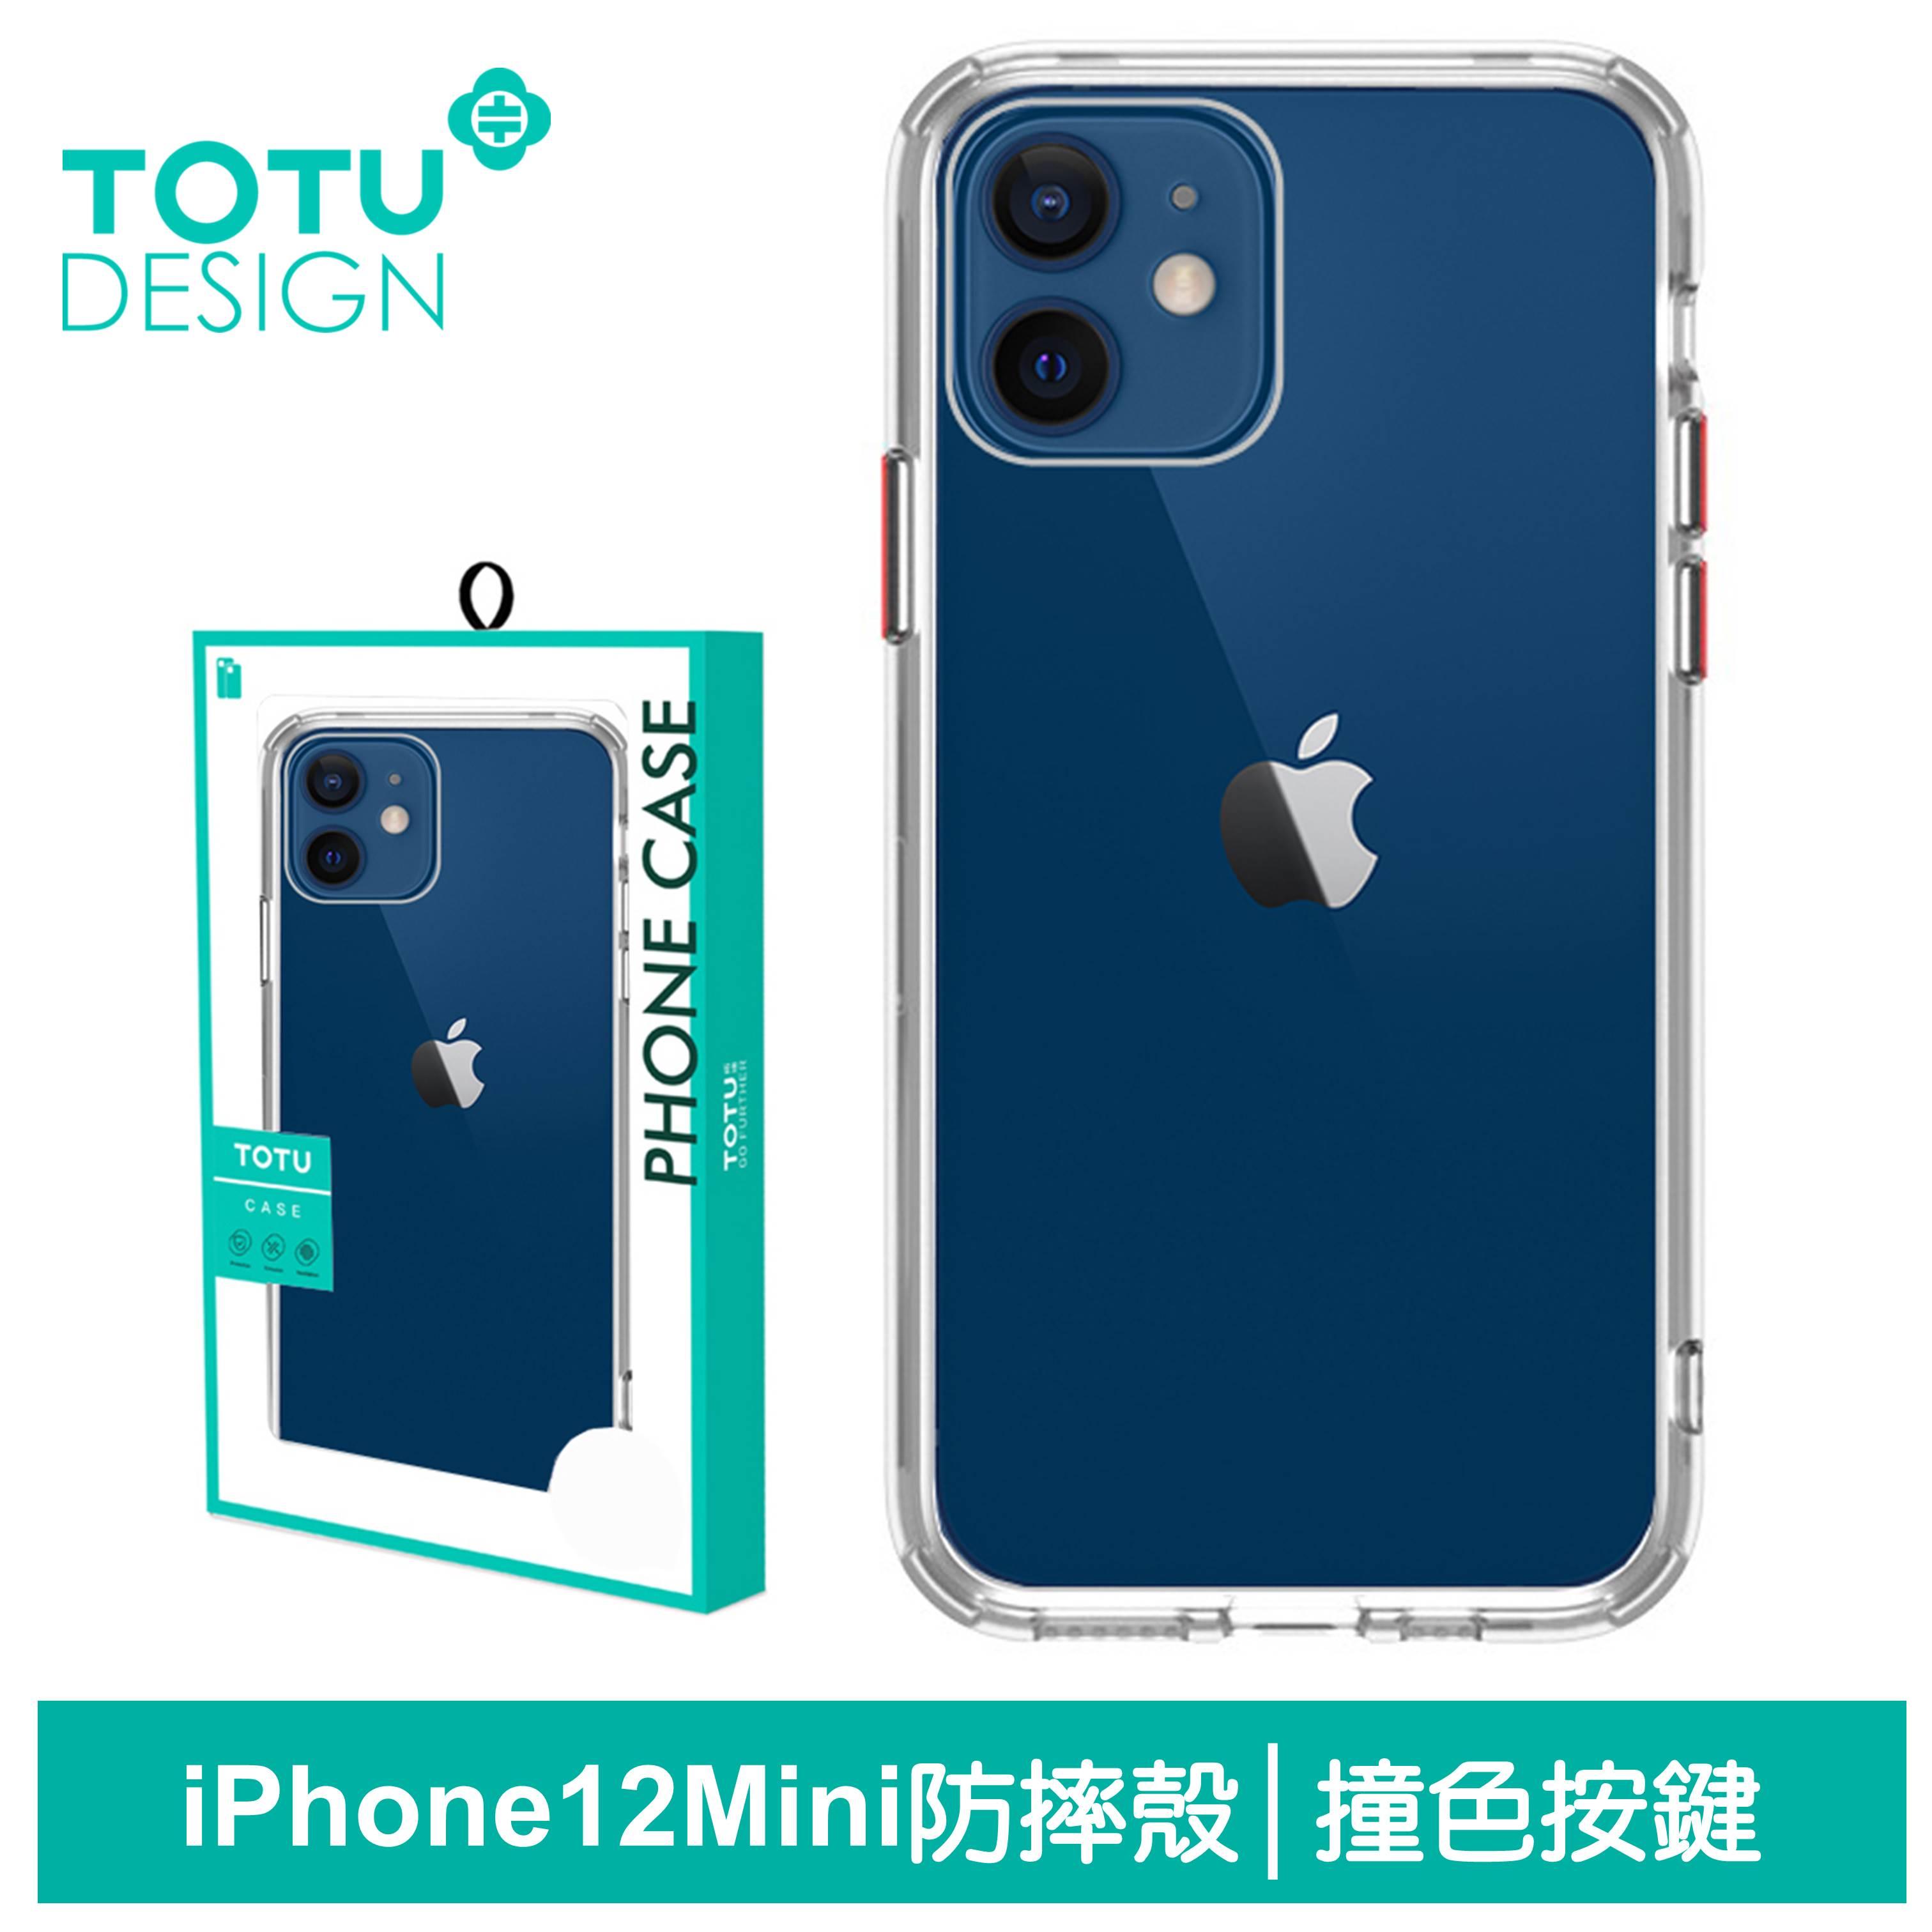 TOTU台灣官方 iPhone 12 Mini 手機殼 i12 Mini 保護殼 5.4吋 防摔殼 撞色按鍵 晶剛系列 透明